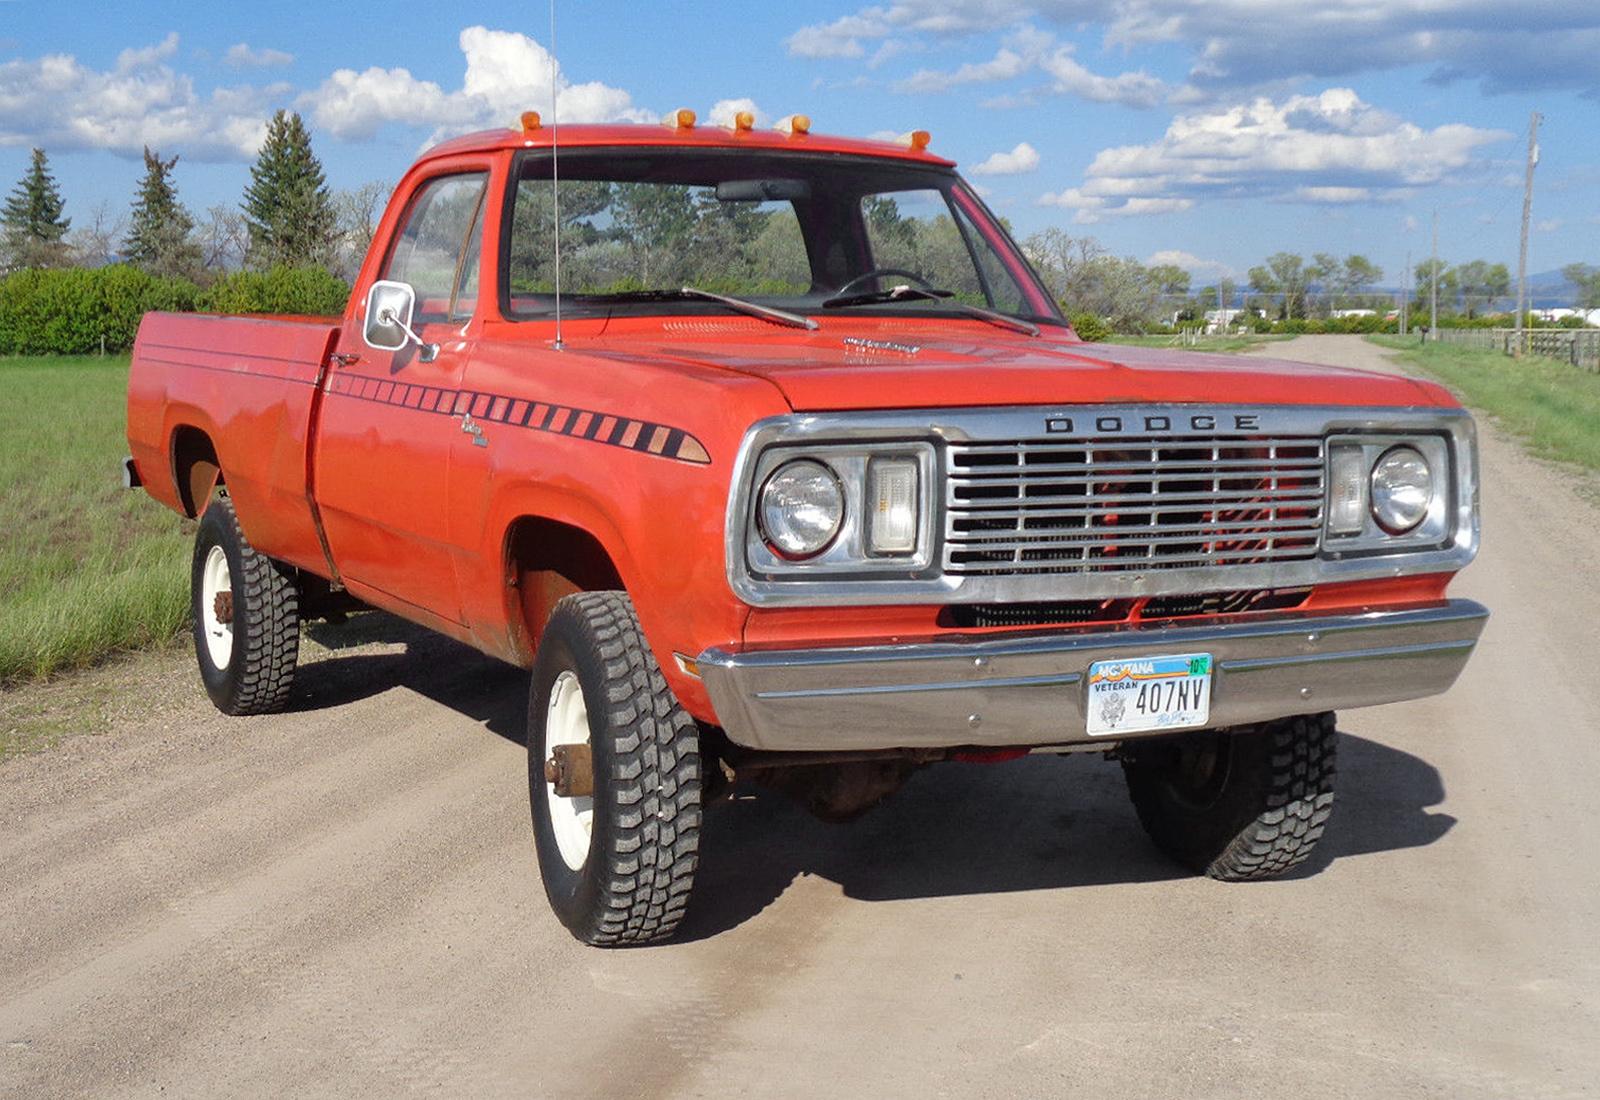 Dodge Pwer Wagon on 1977 Dodge Power Wagon